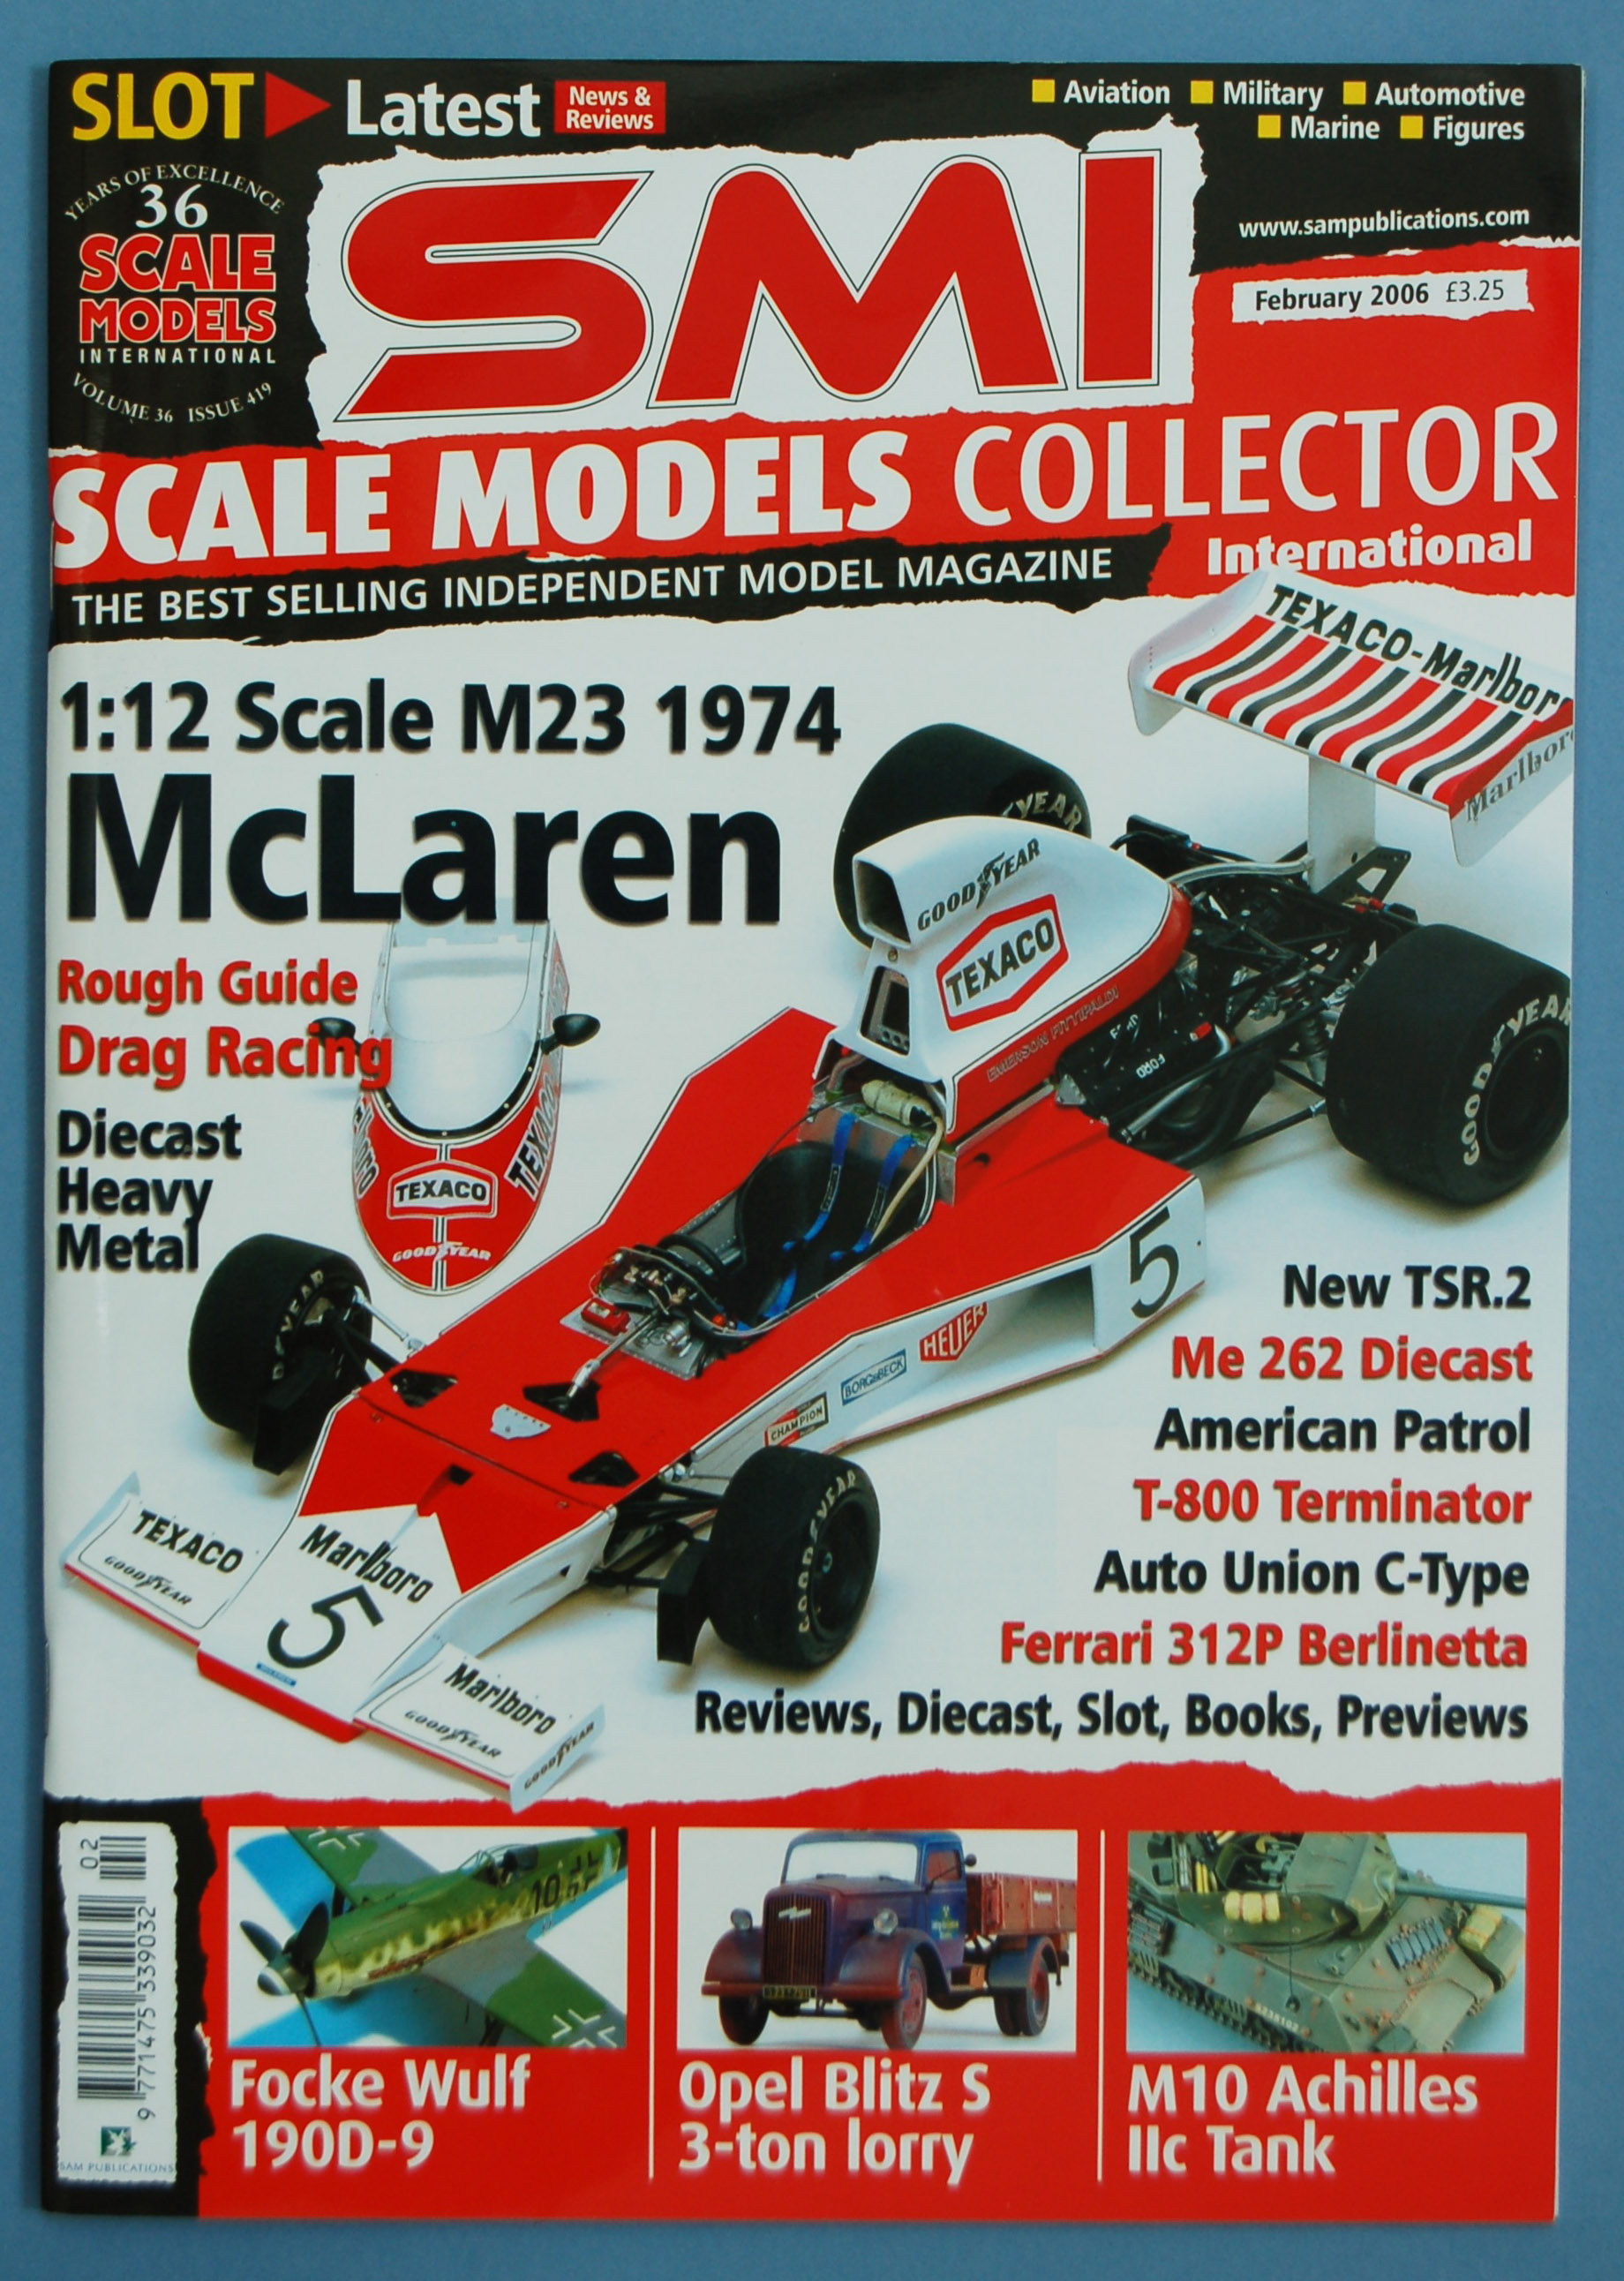 F1 car articles | MRO F1 Engineering